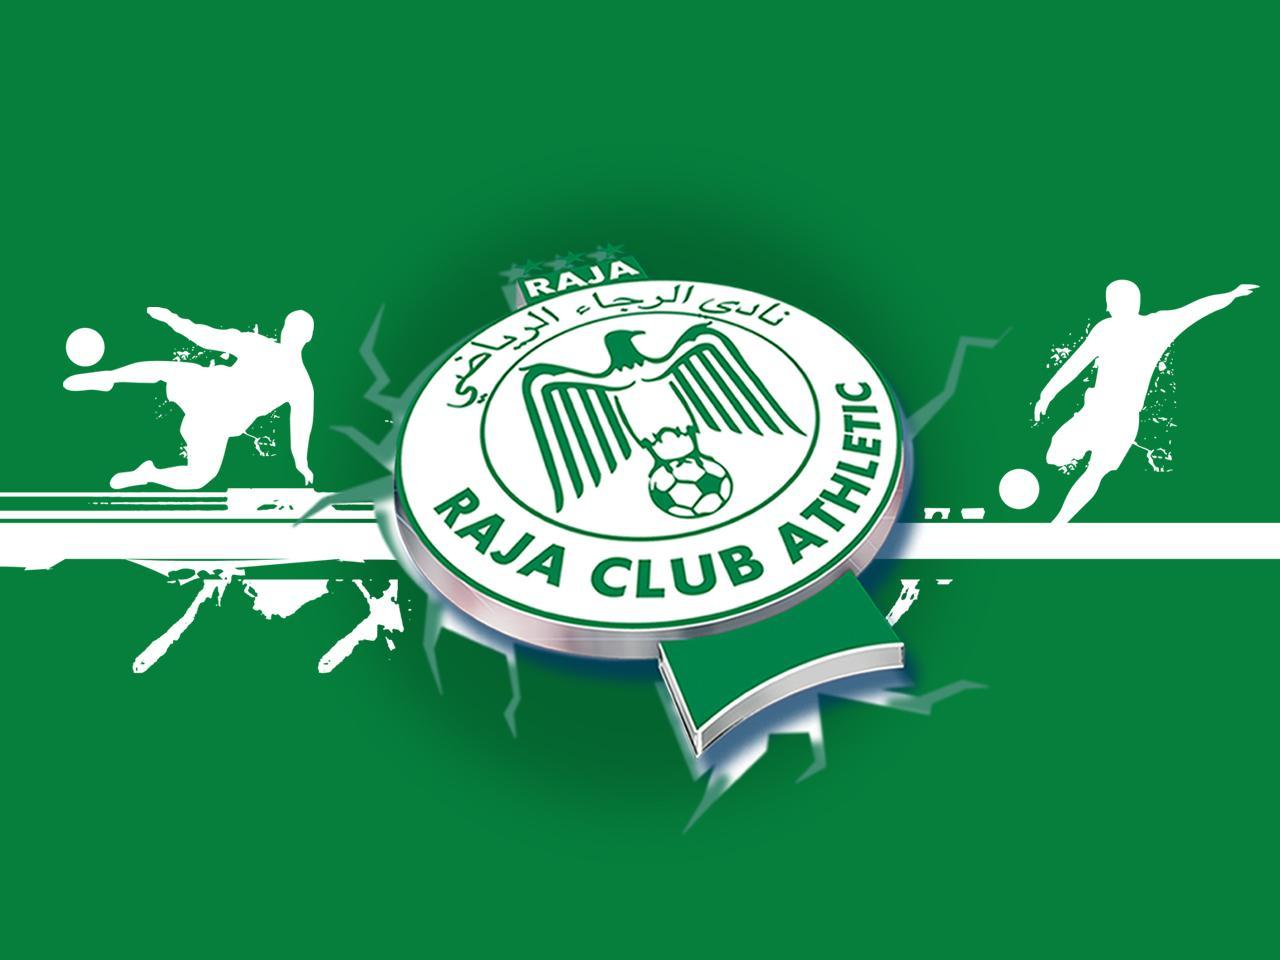 Raja Club Athletic Wallpapers Wallpaper Cave